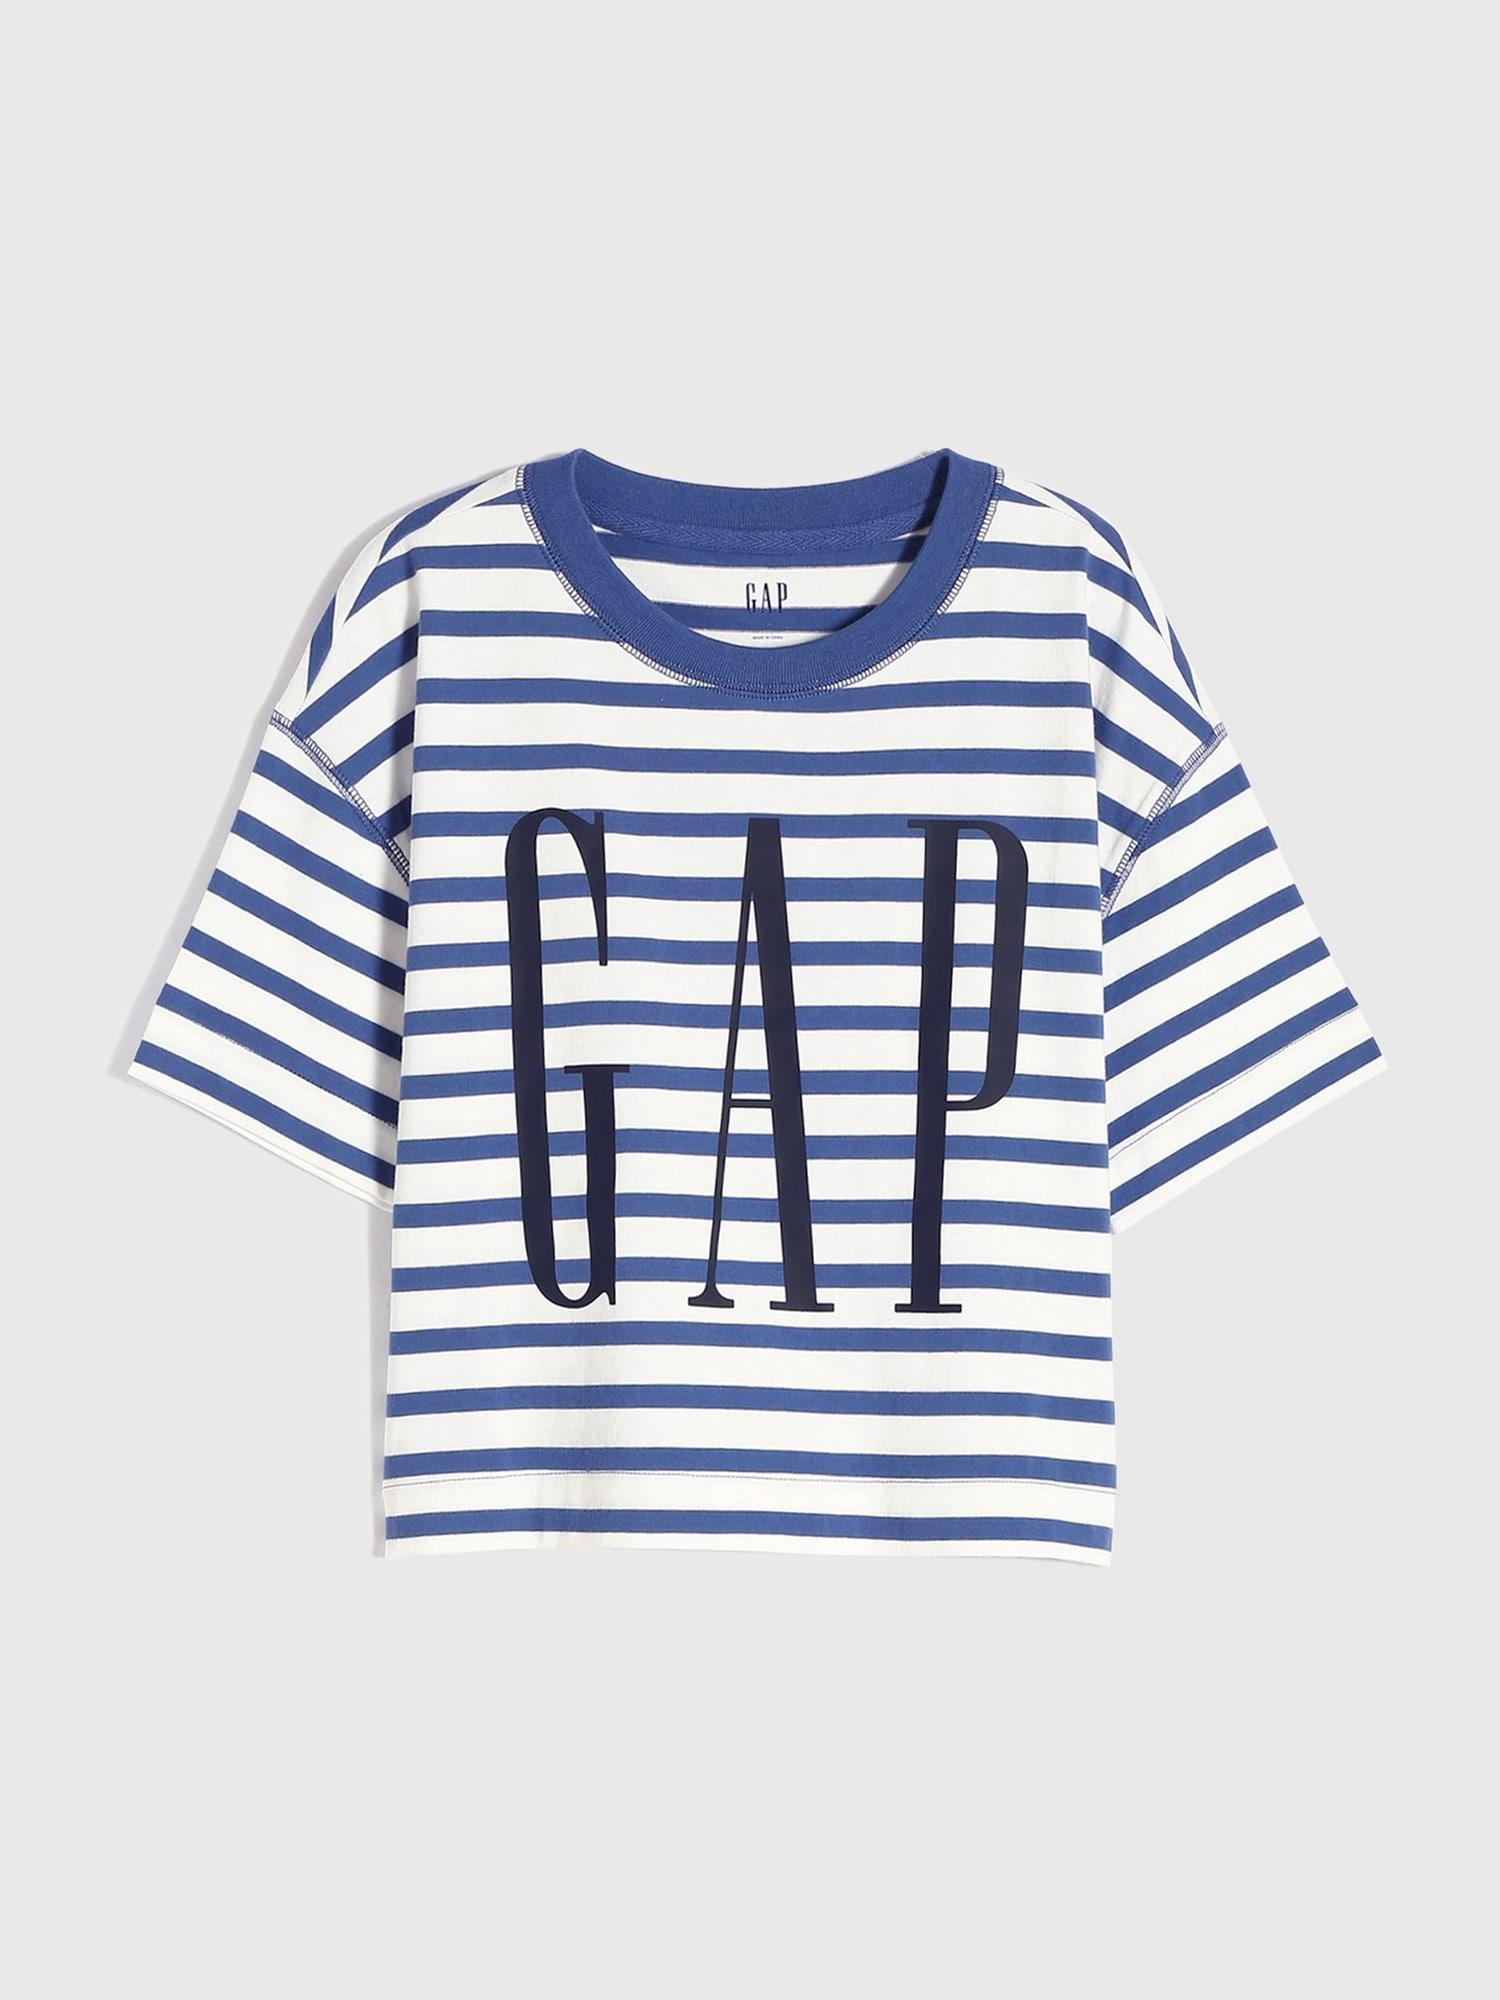 Gapロゴ ストライプtシャツ